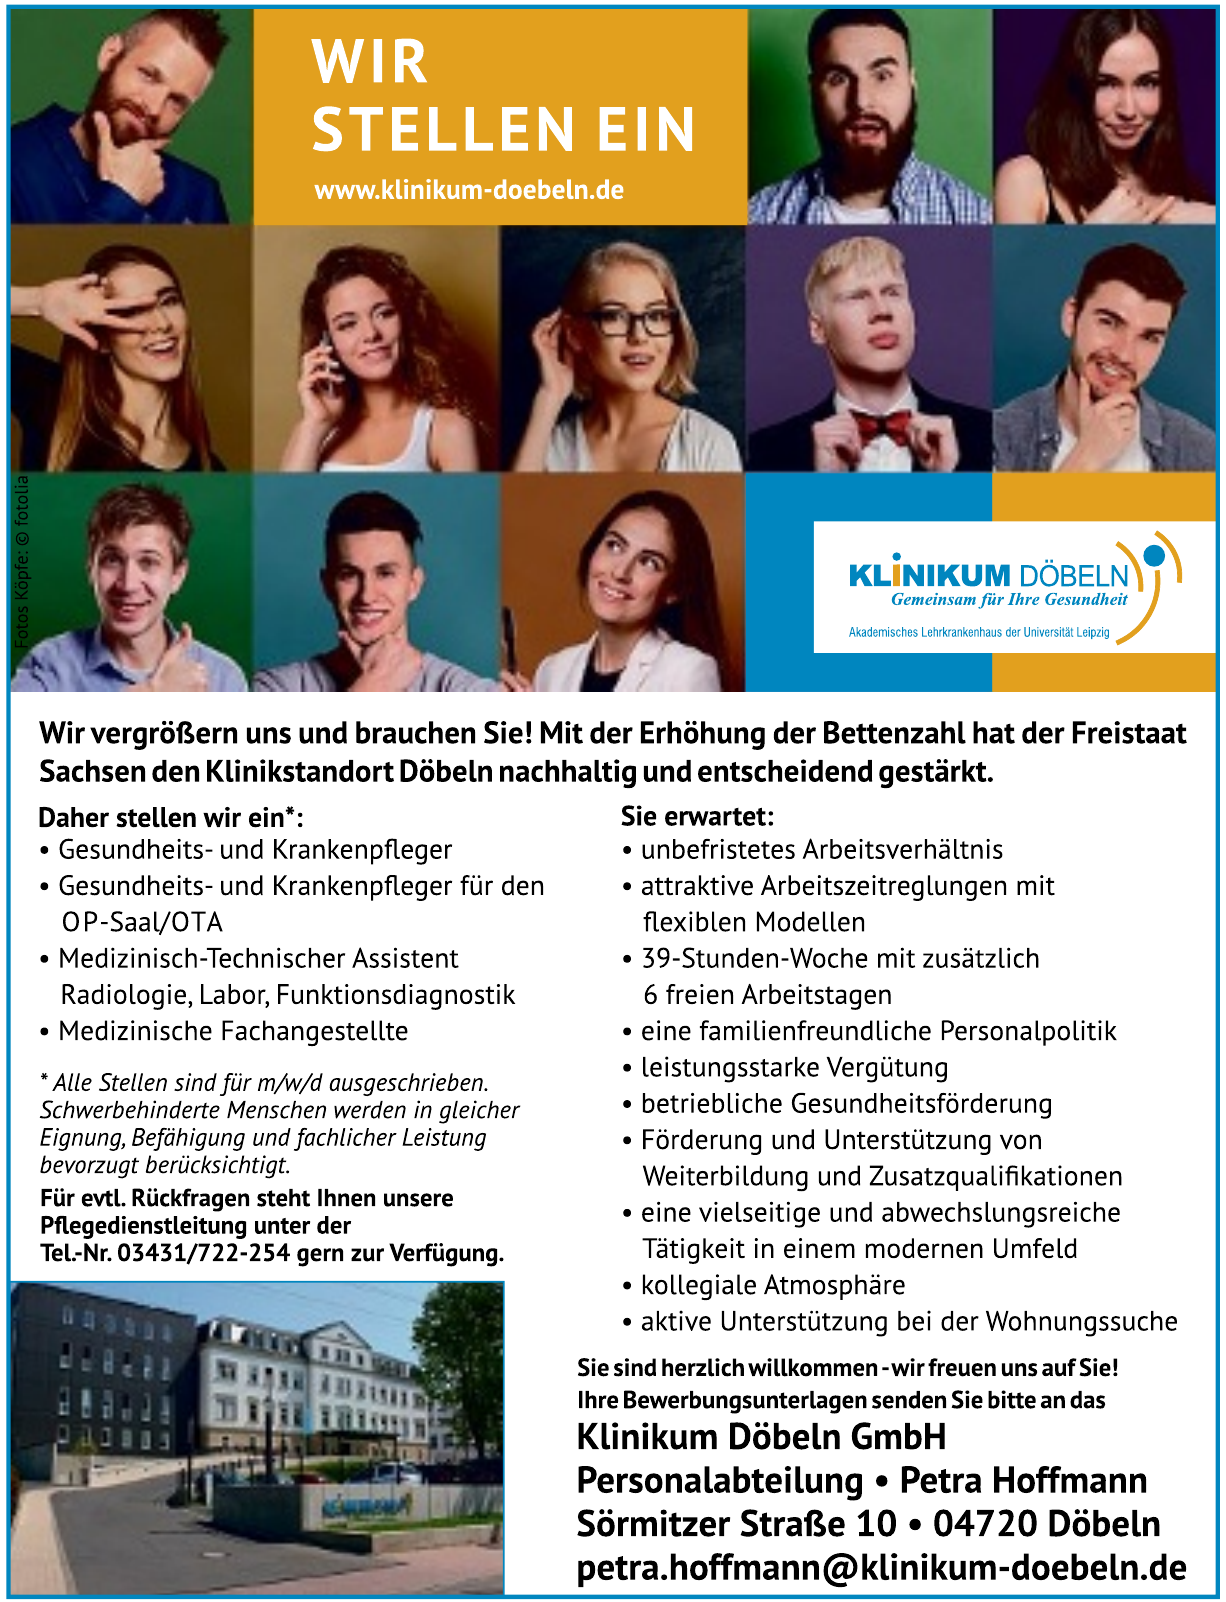 Klinikum Döbeln GmbH